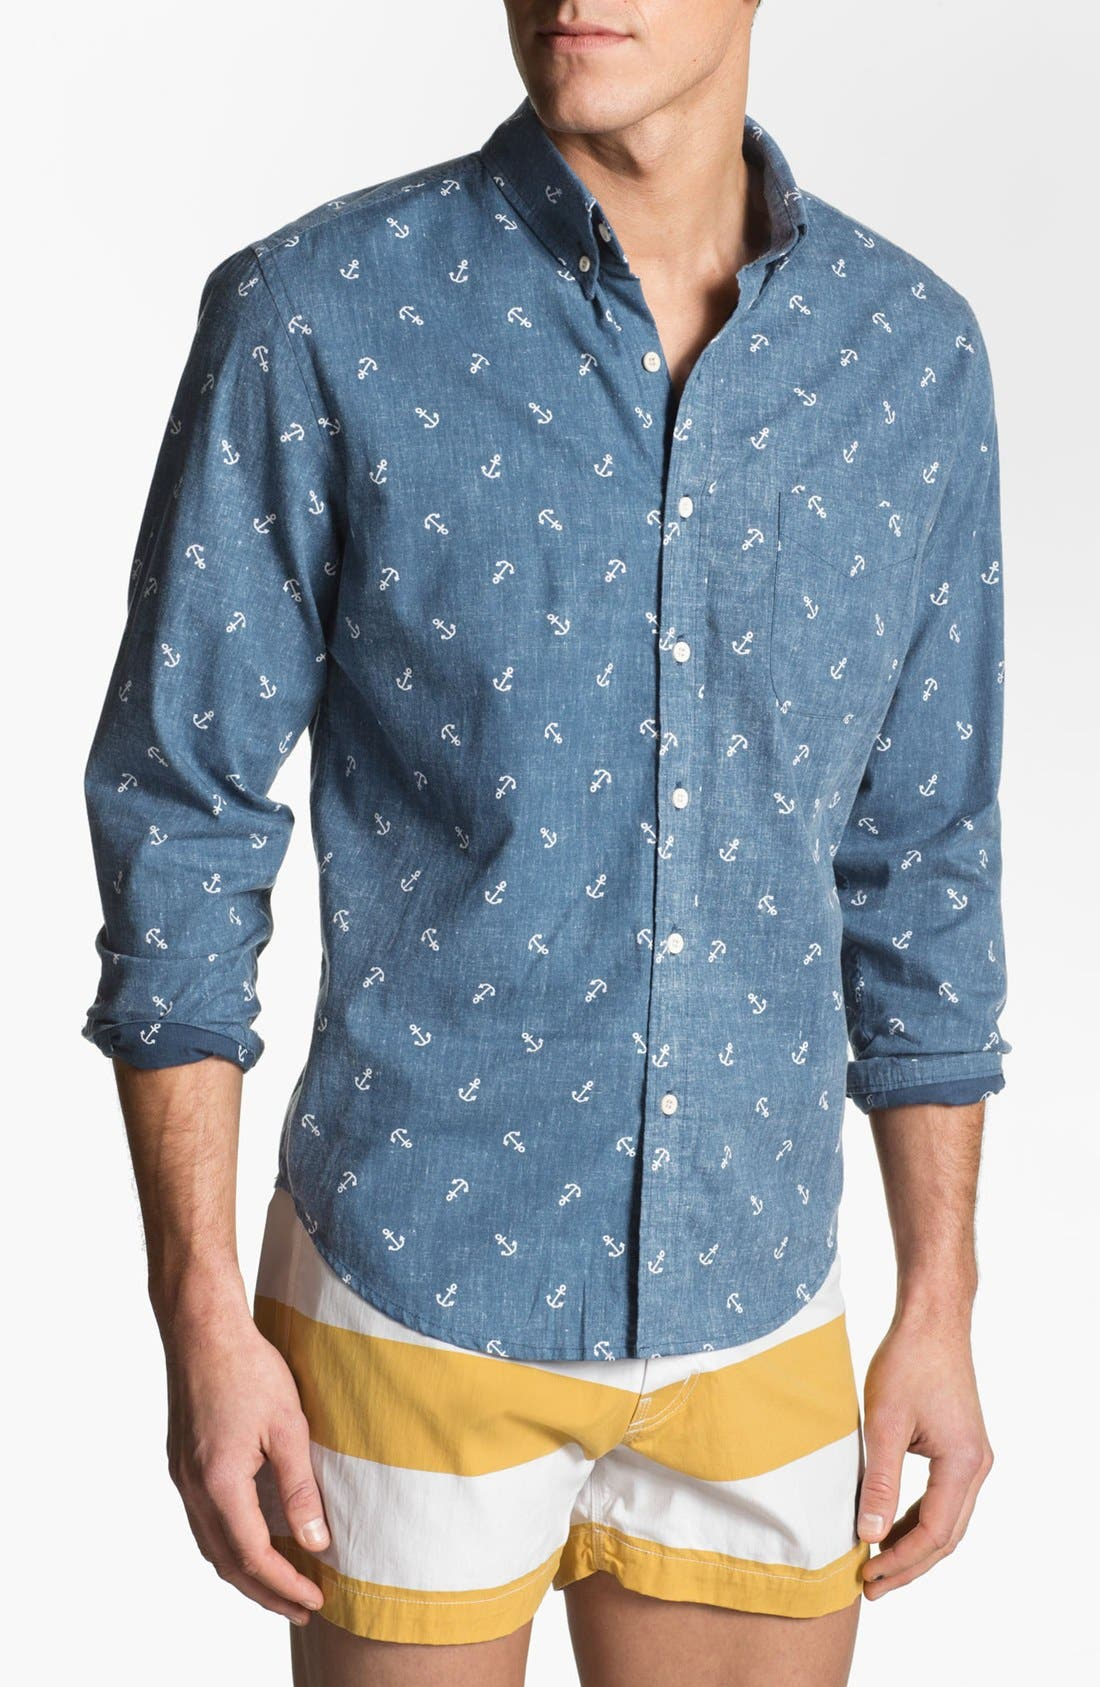 Alternate Image 1 Selected - Altru 'Anchors' Print Woven Shirt